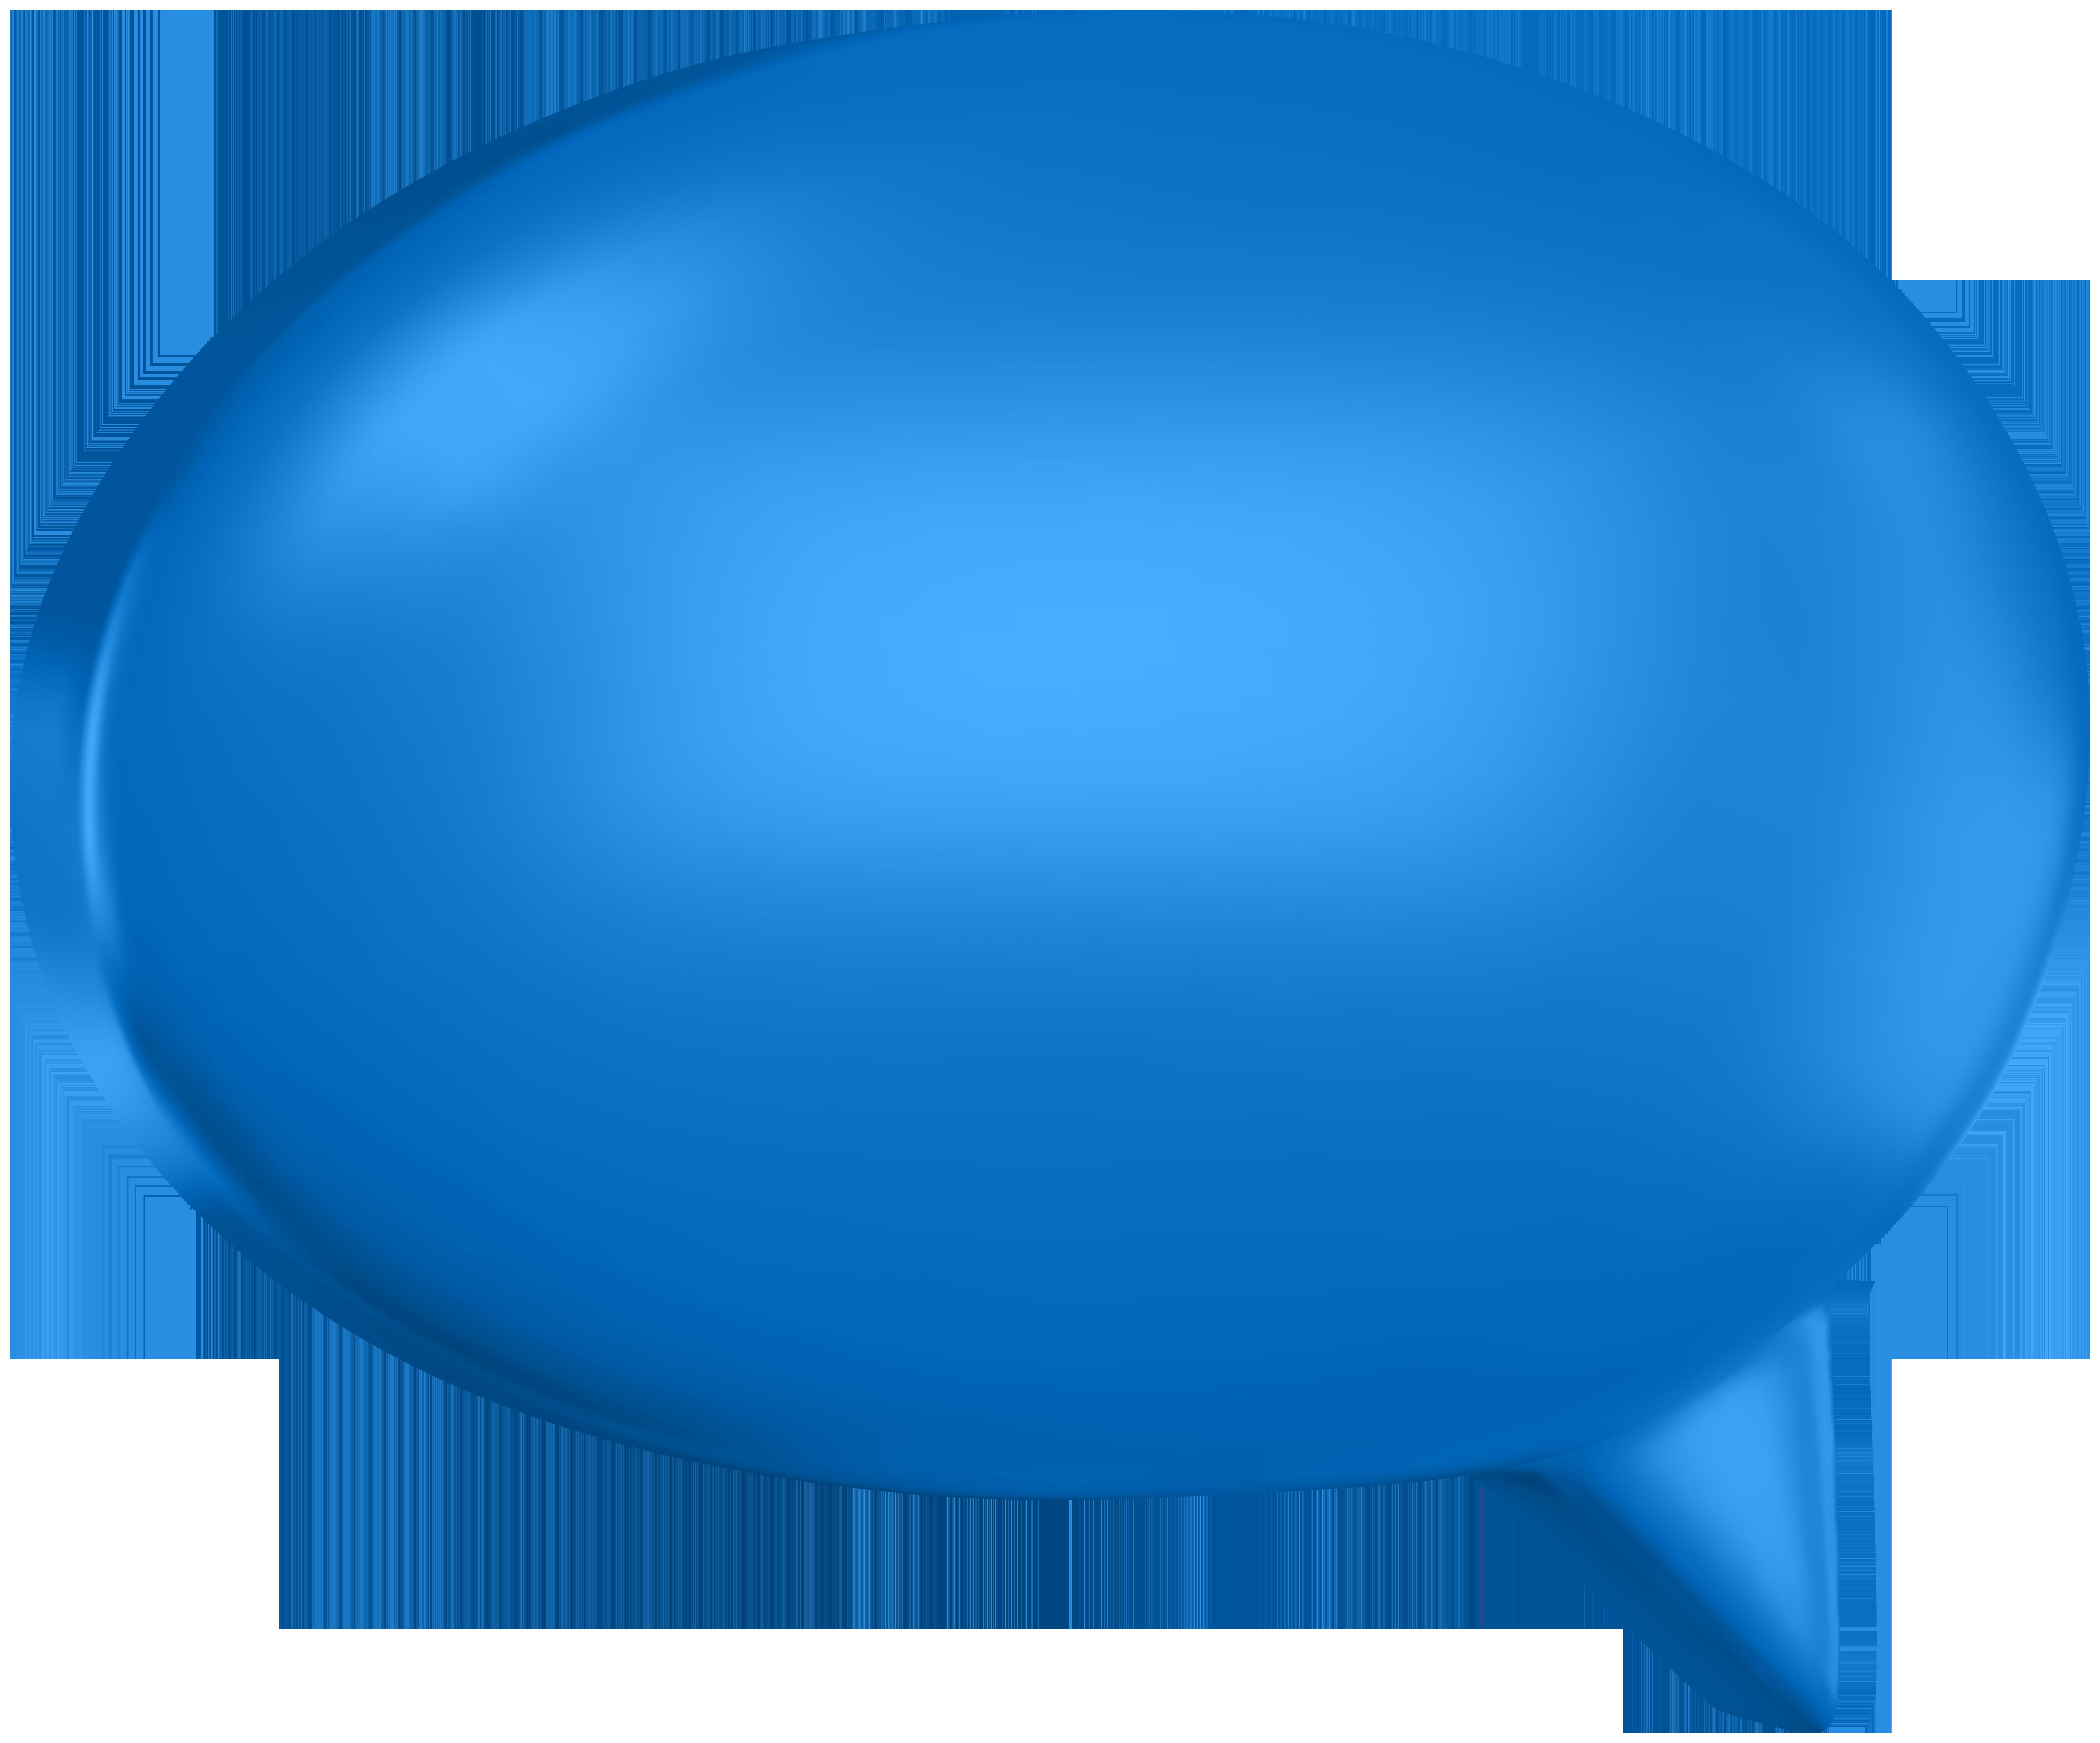 Blue speech bubble clipart image royalty free stock Blue Speech Bubble Clip Art Image   Gallery Yopriceville - High ... image royalty free stock